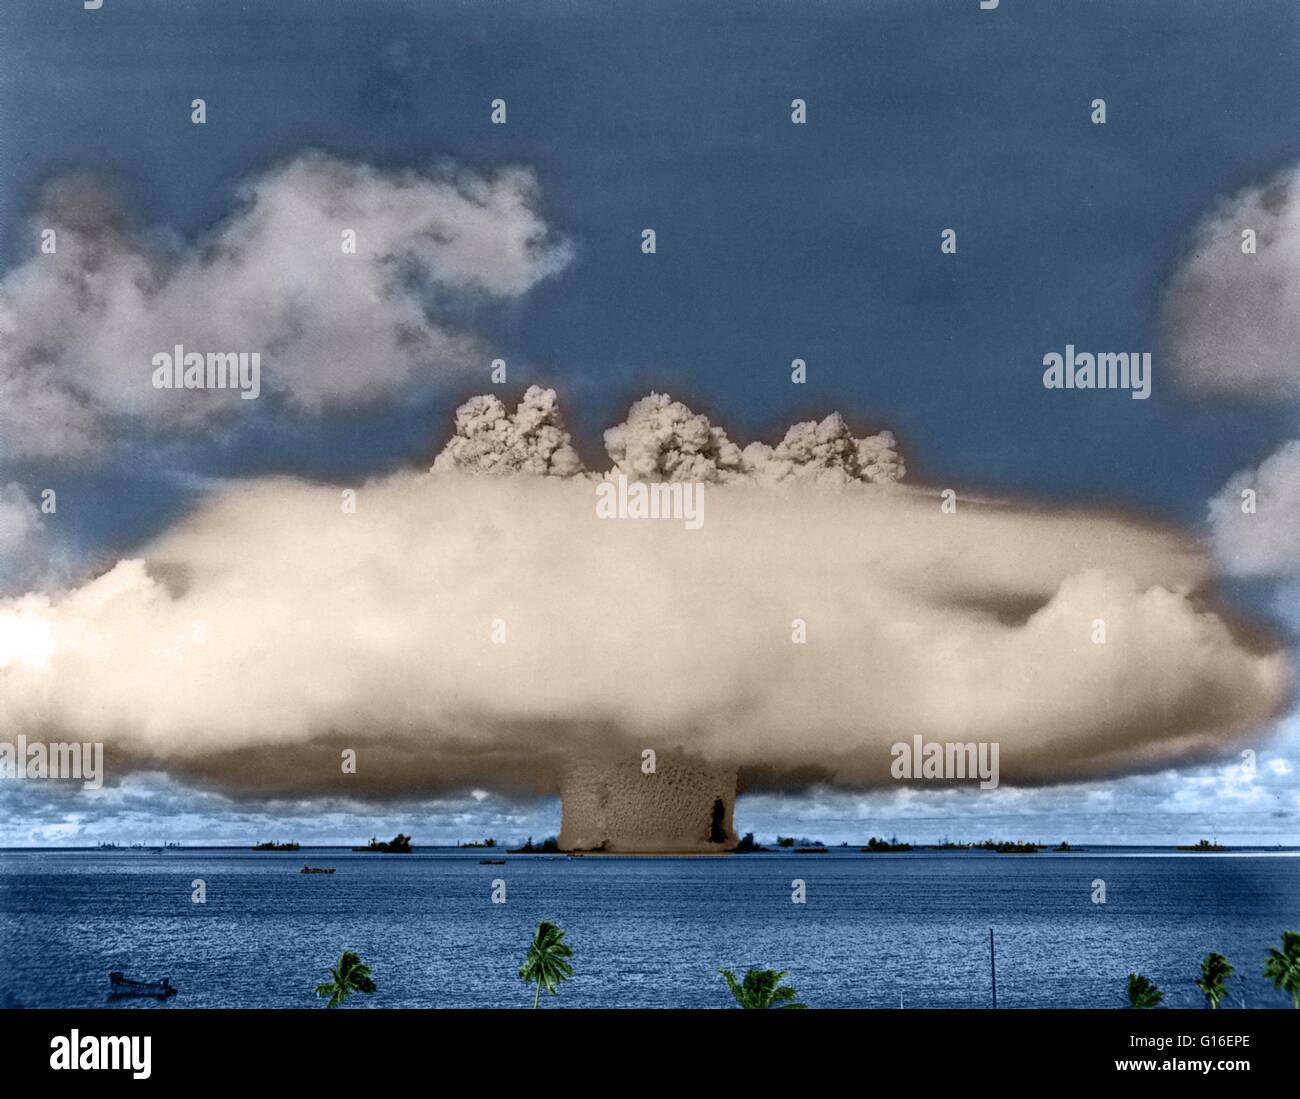 Atoll of bikini commit